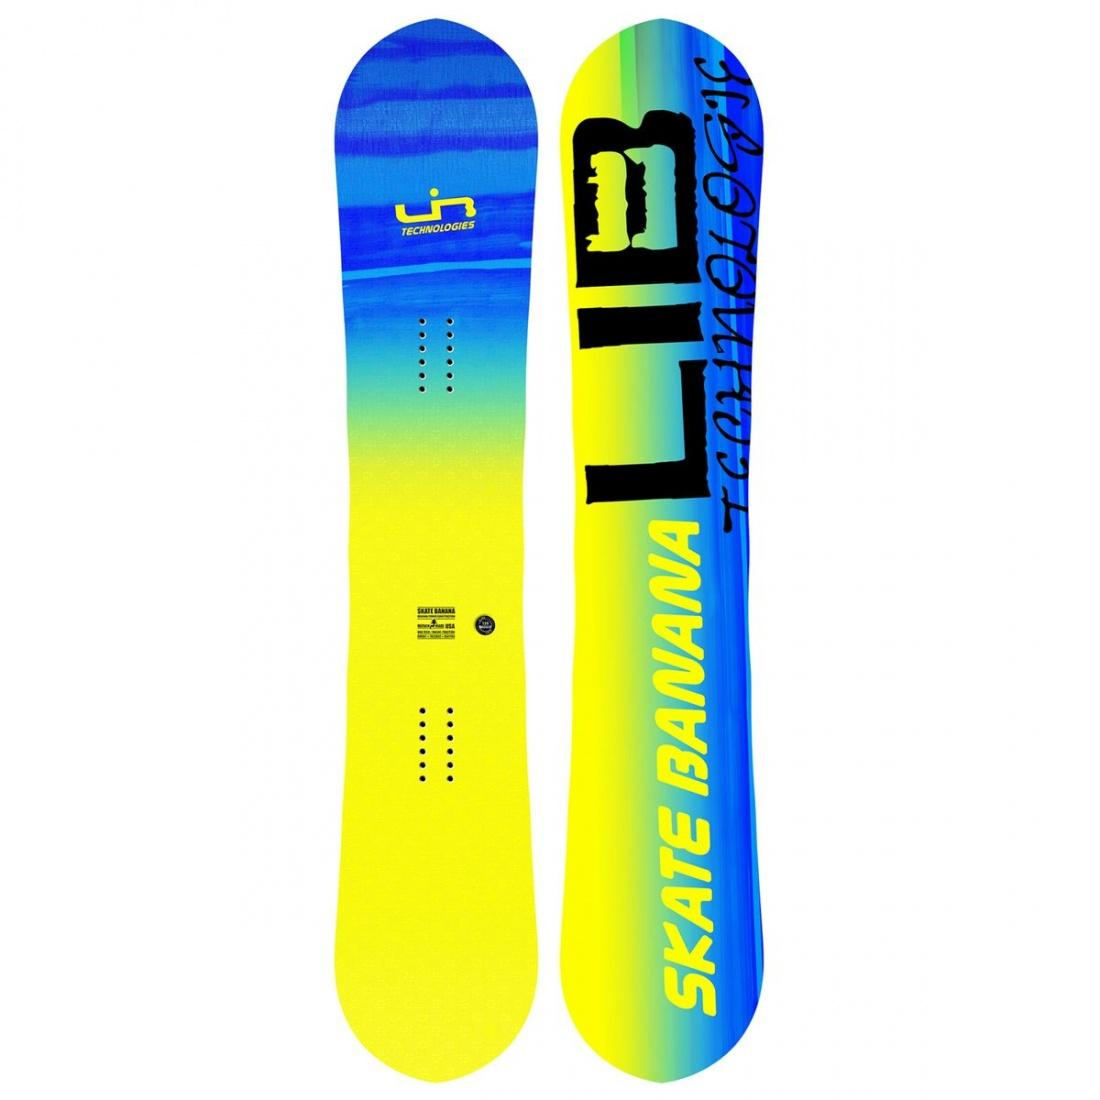 Сноуборд Lib Tech SK8 Banana BTX купить в Boardshop №1